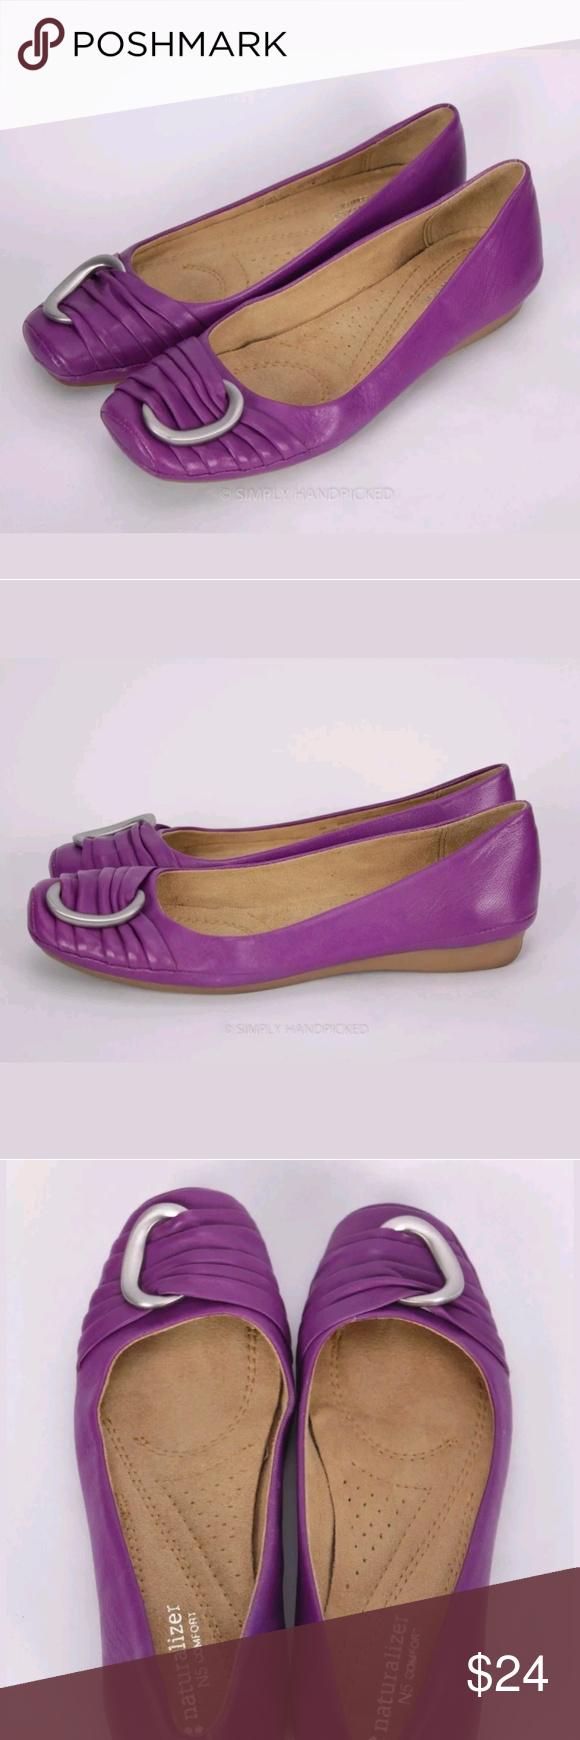 Naturalizer N5 Comfort Purple Leather Flats Size 7 Naturalizer N5 Comfort  Violette Purple Leather Flats Women's